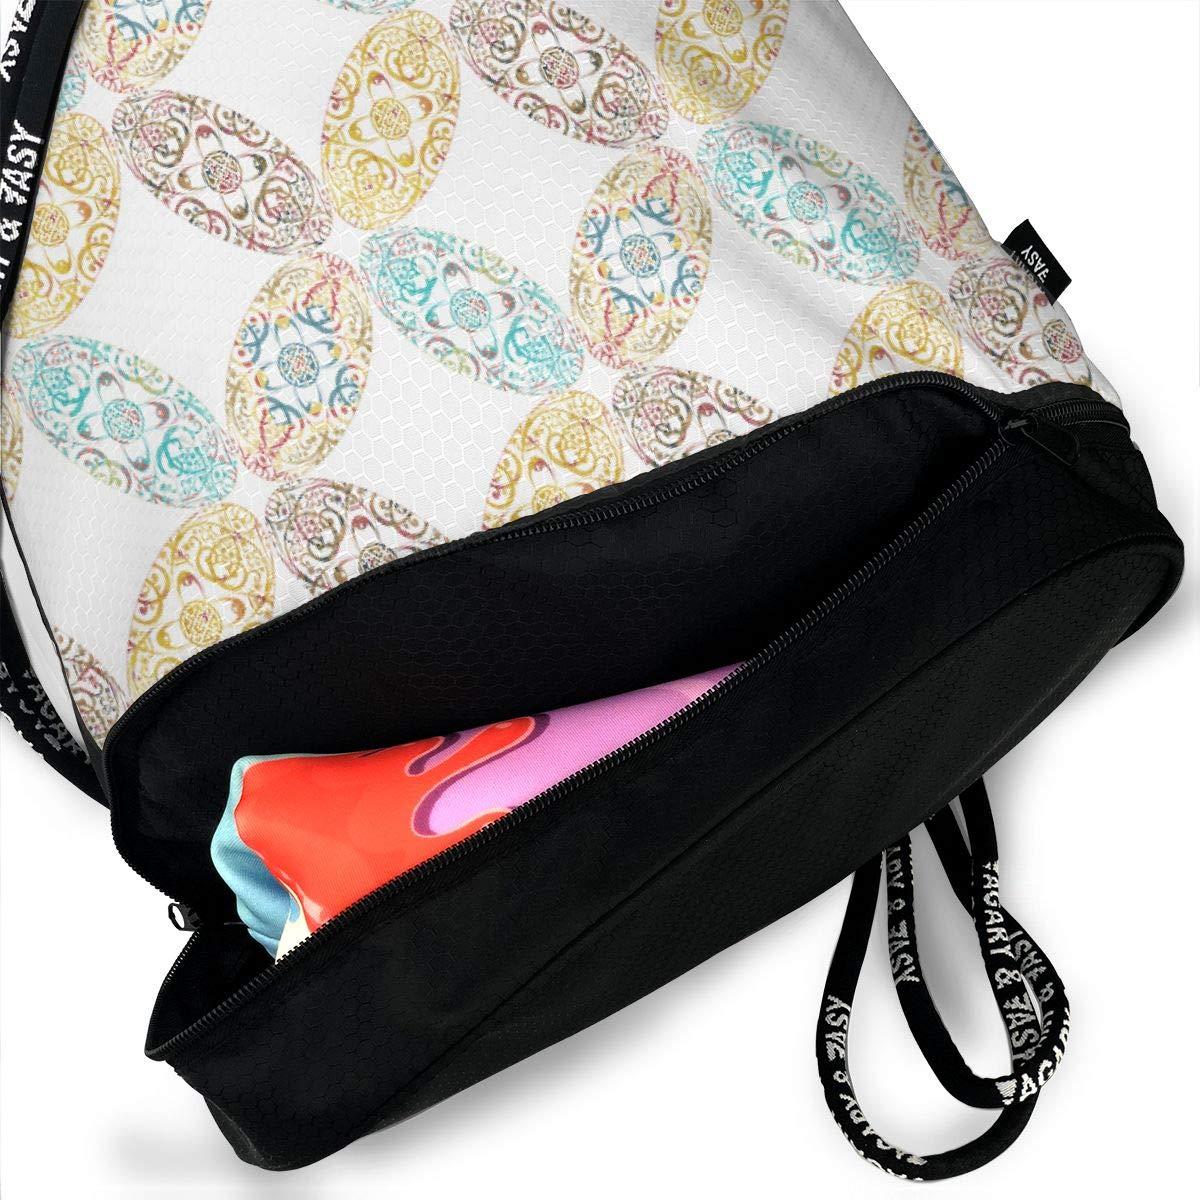 Sprudla Ellipse All Tilt Drawstring Backpack Sports Athletic Gym Cinch Sack String Storage Bags for Hiking Travel Beach